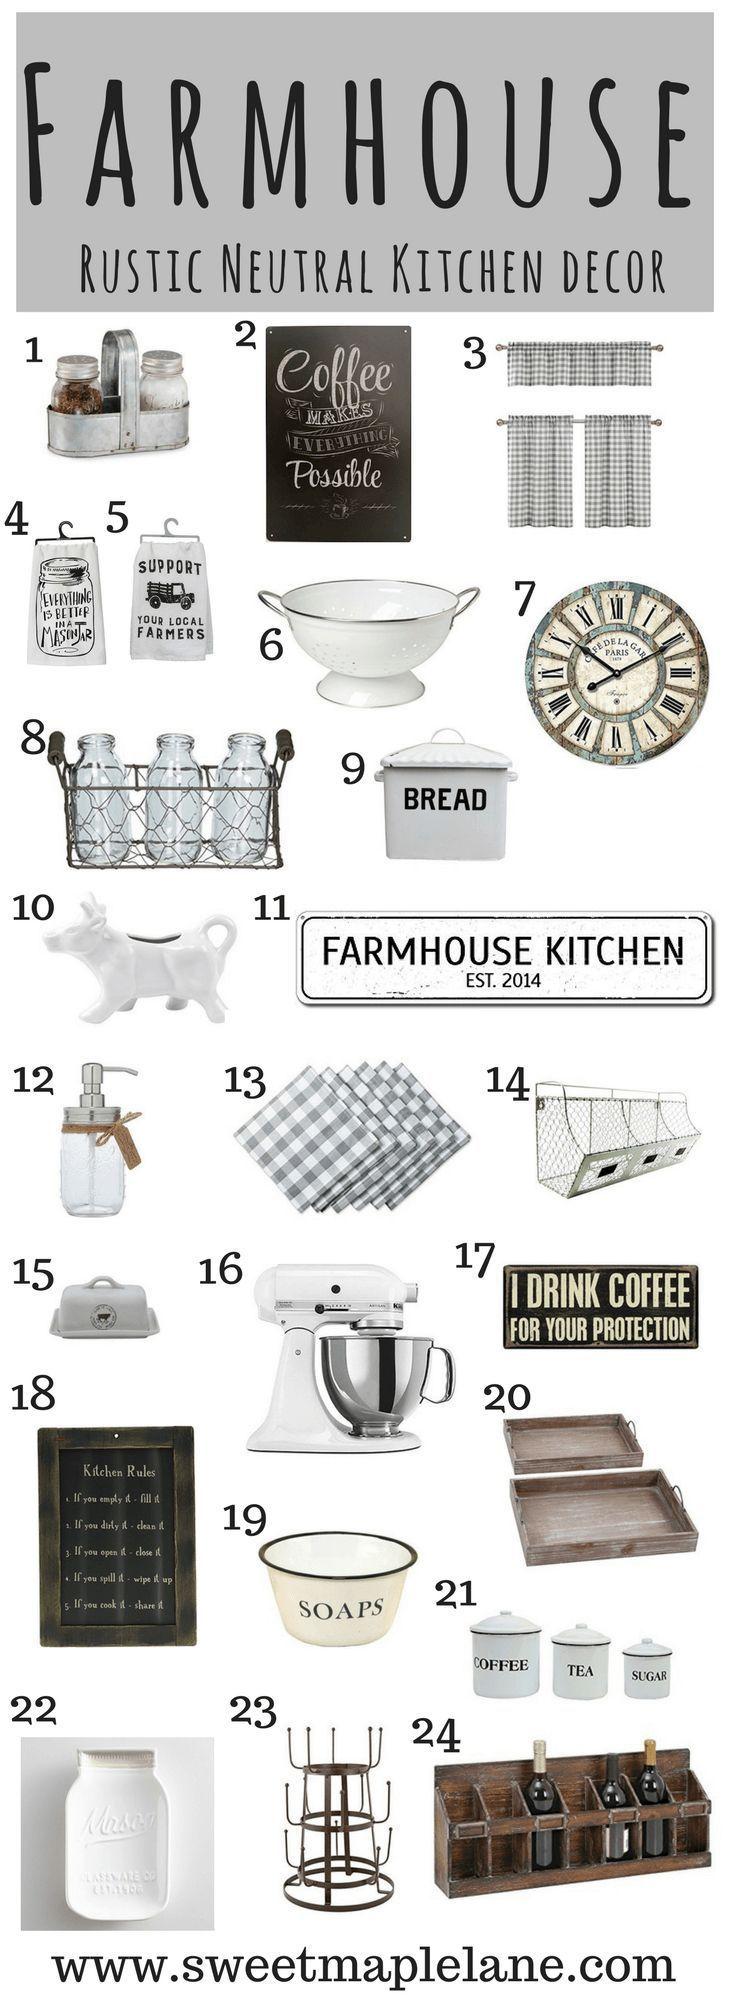 kitchen / farmhouse / industrial / neutral / kitchen decor / home decor / storage / wooden sign / plaid